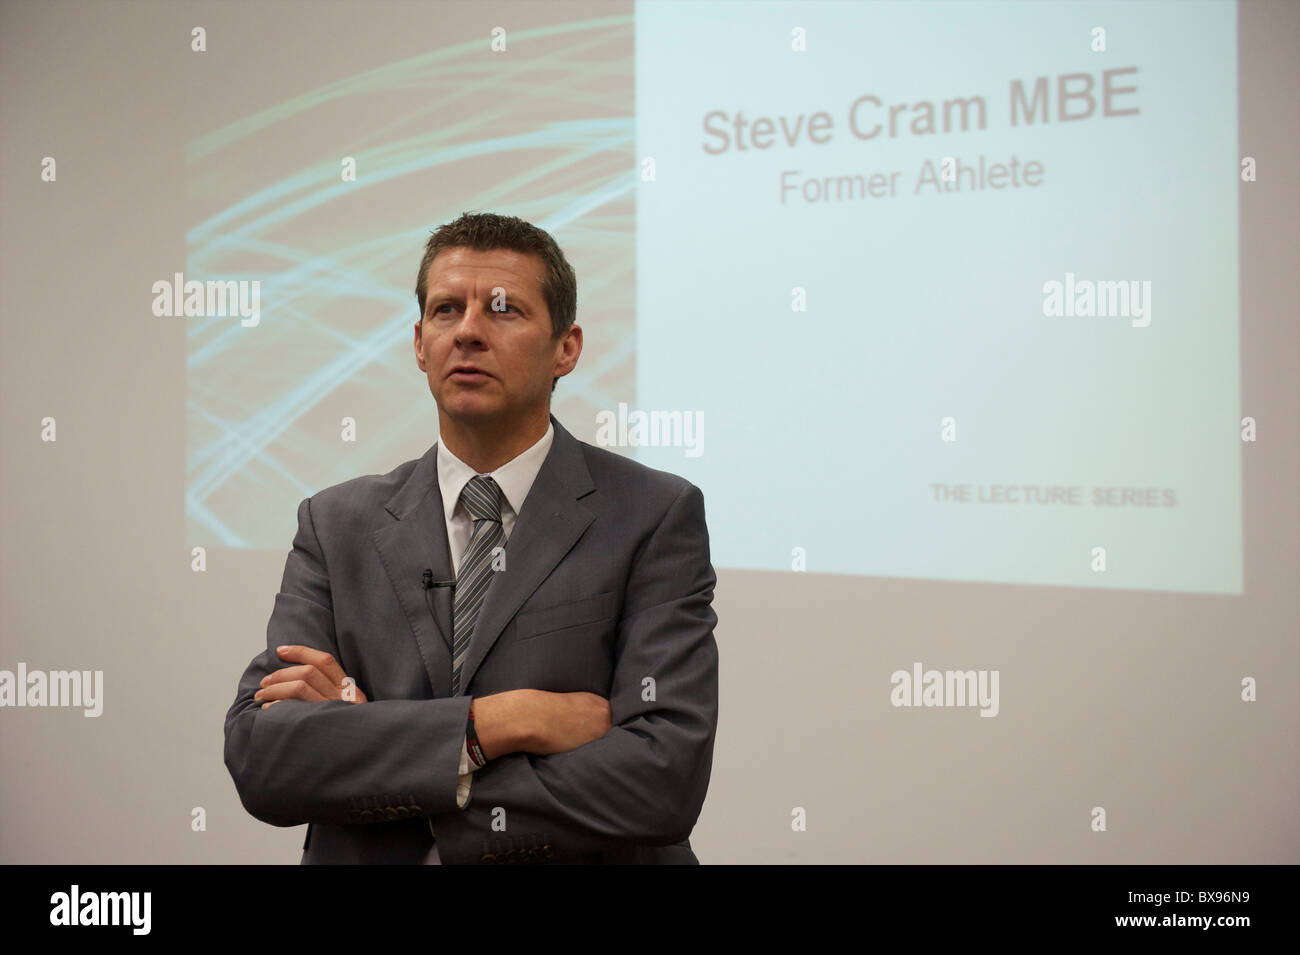 Gold medalist Steve Cram delivered a lecture as part of De Montfort University's Distinguished Lecture Series - Stock Image